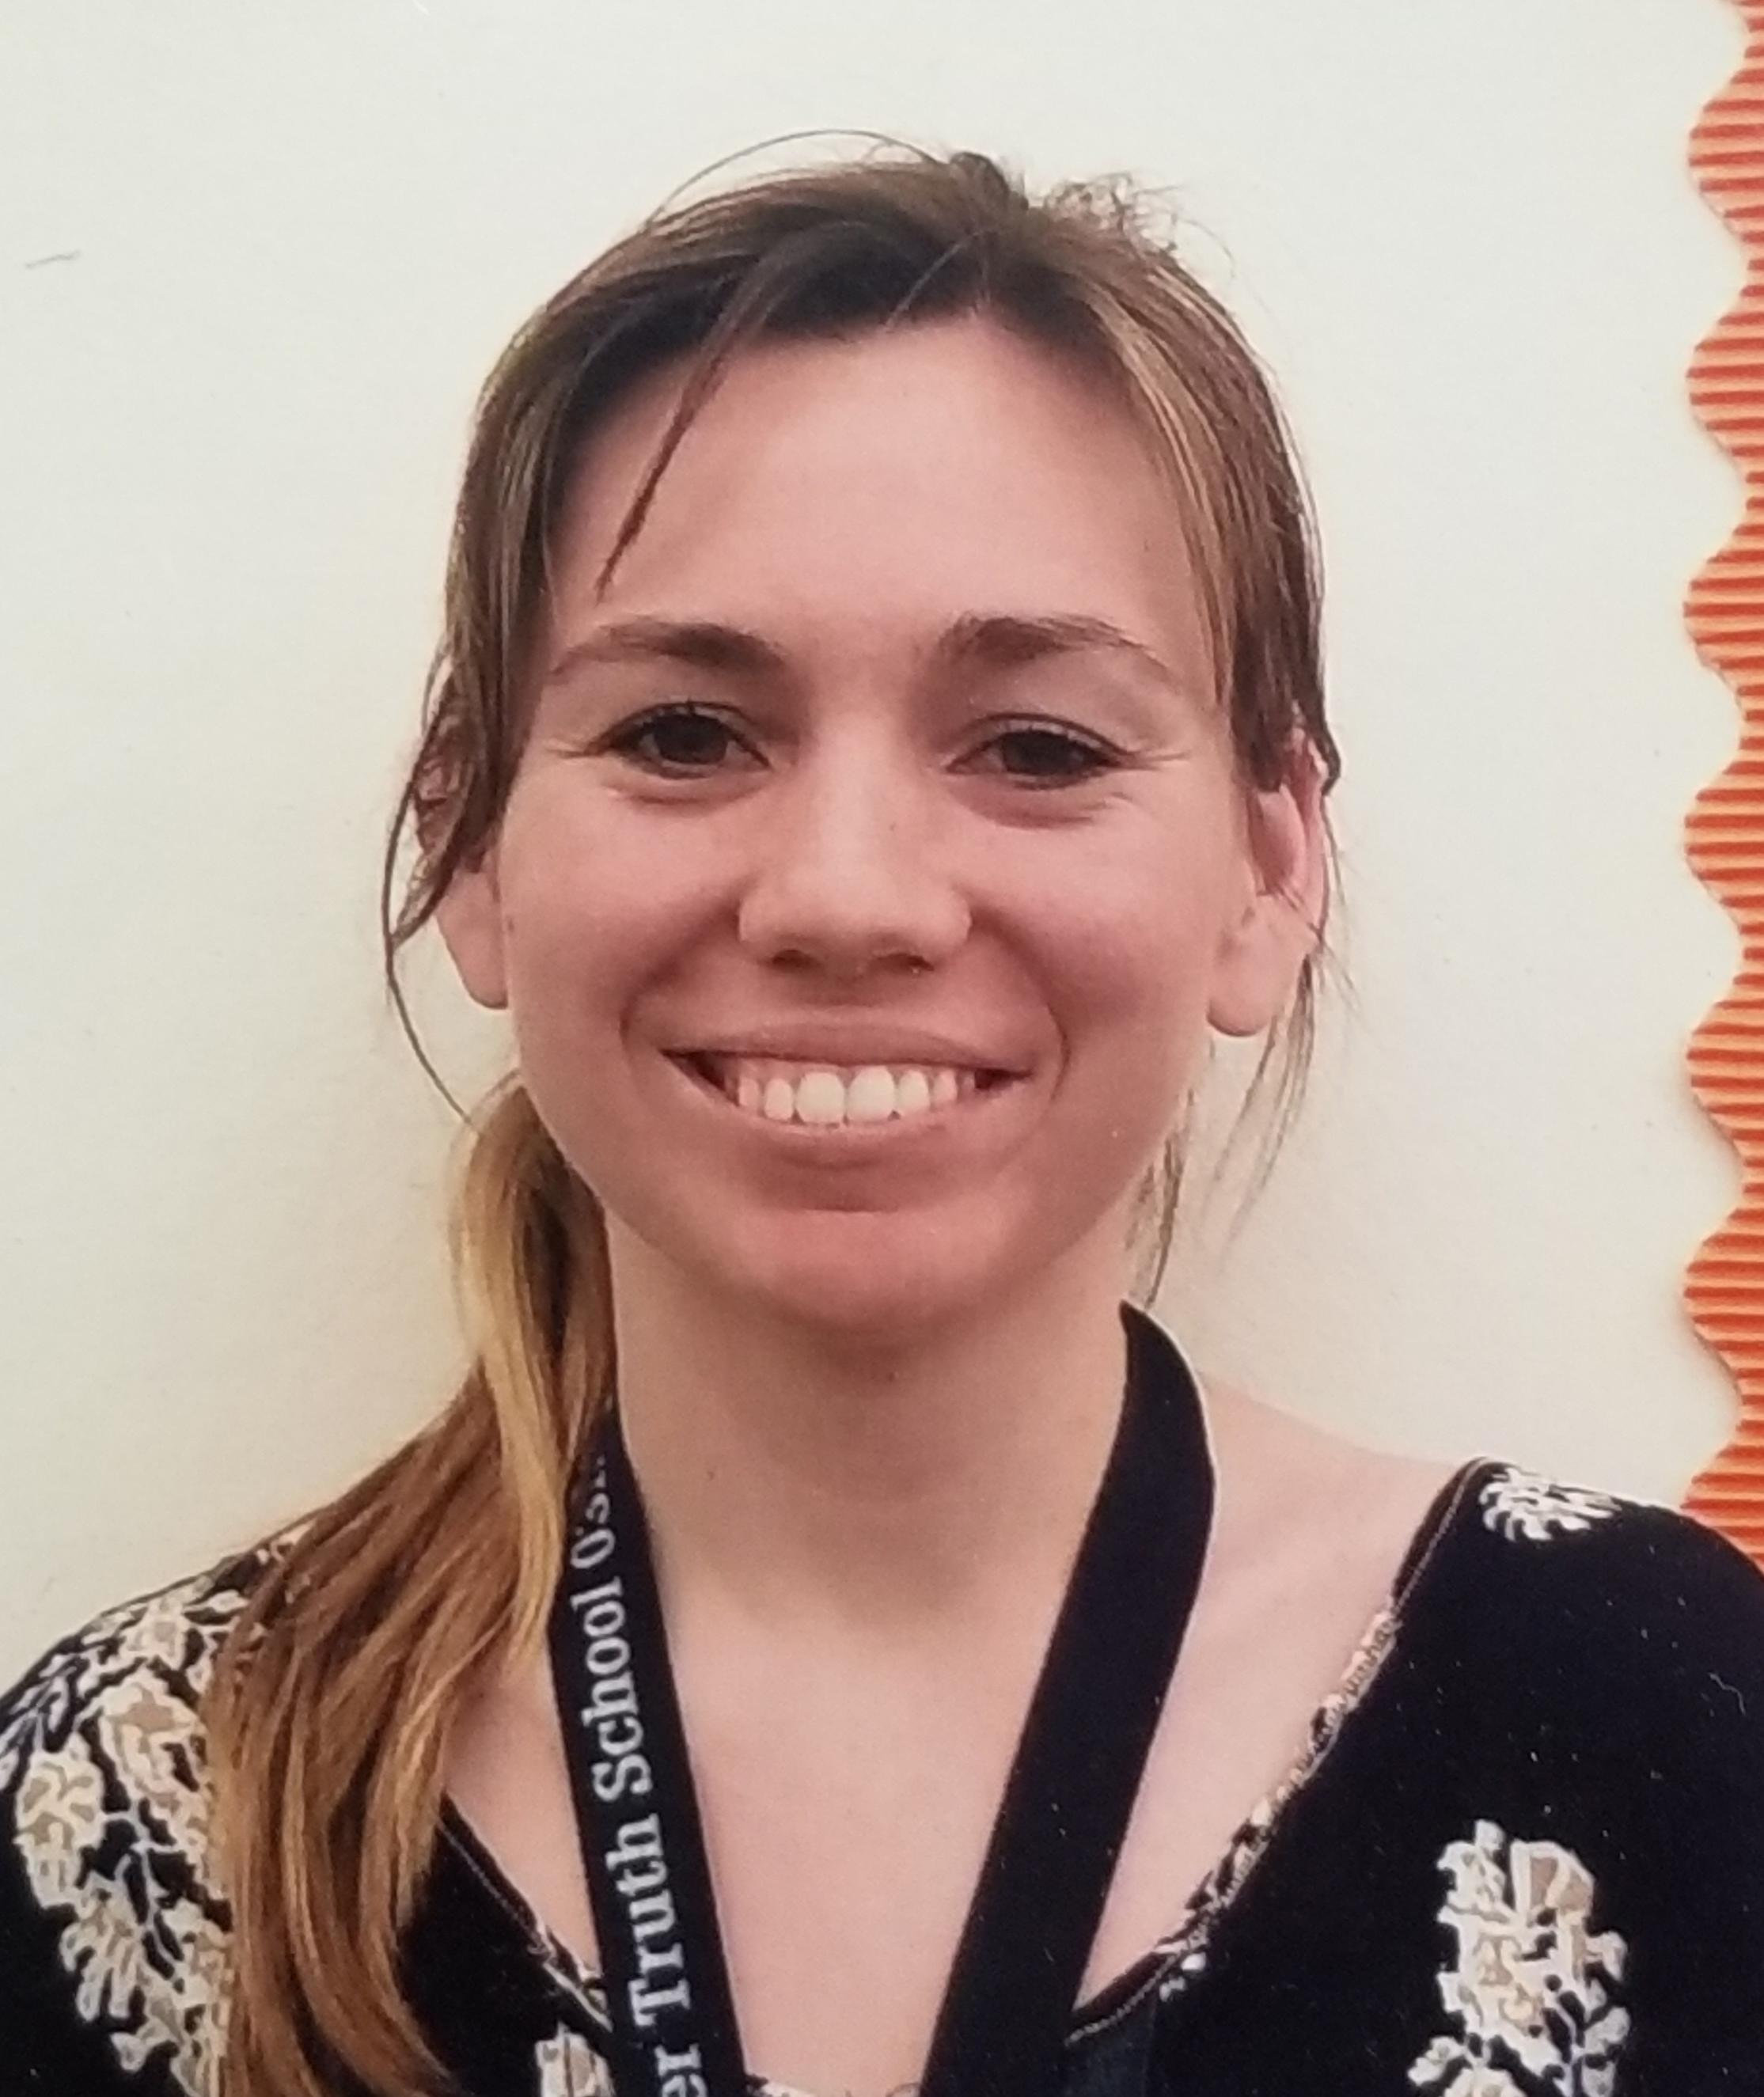 Photo of Ms. Casey our 3rd grade teacher.